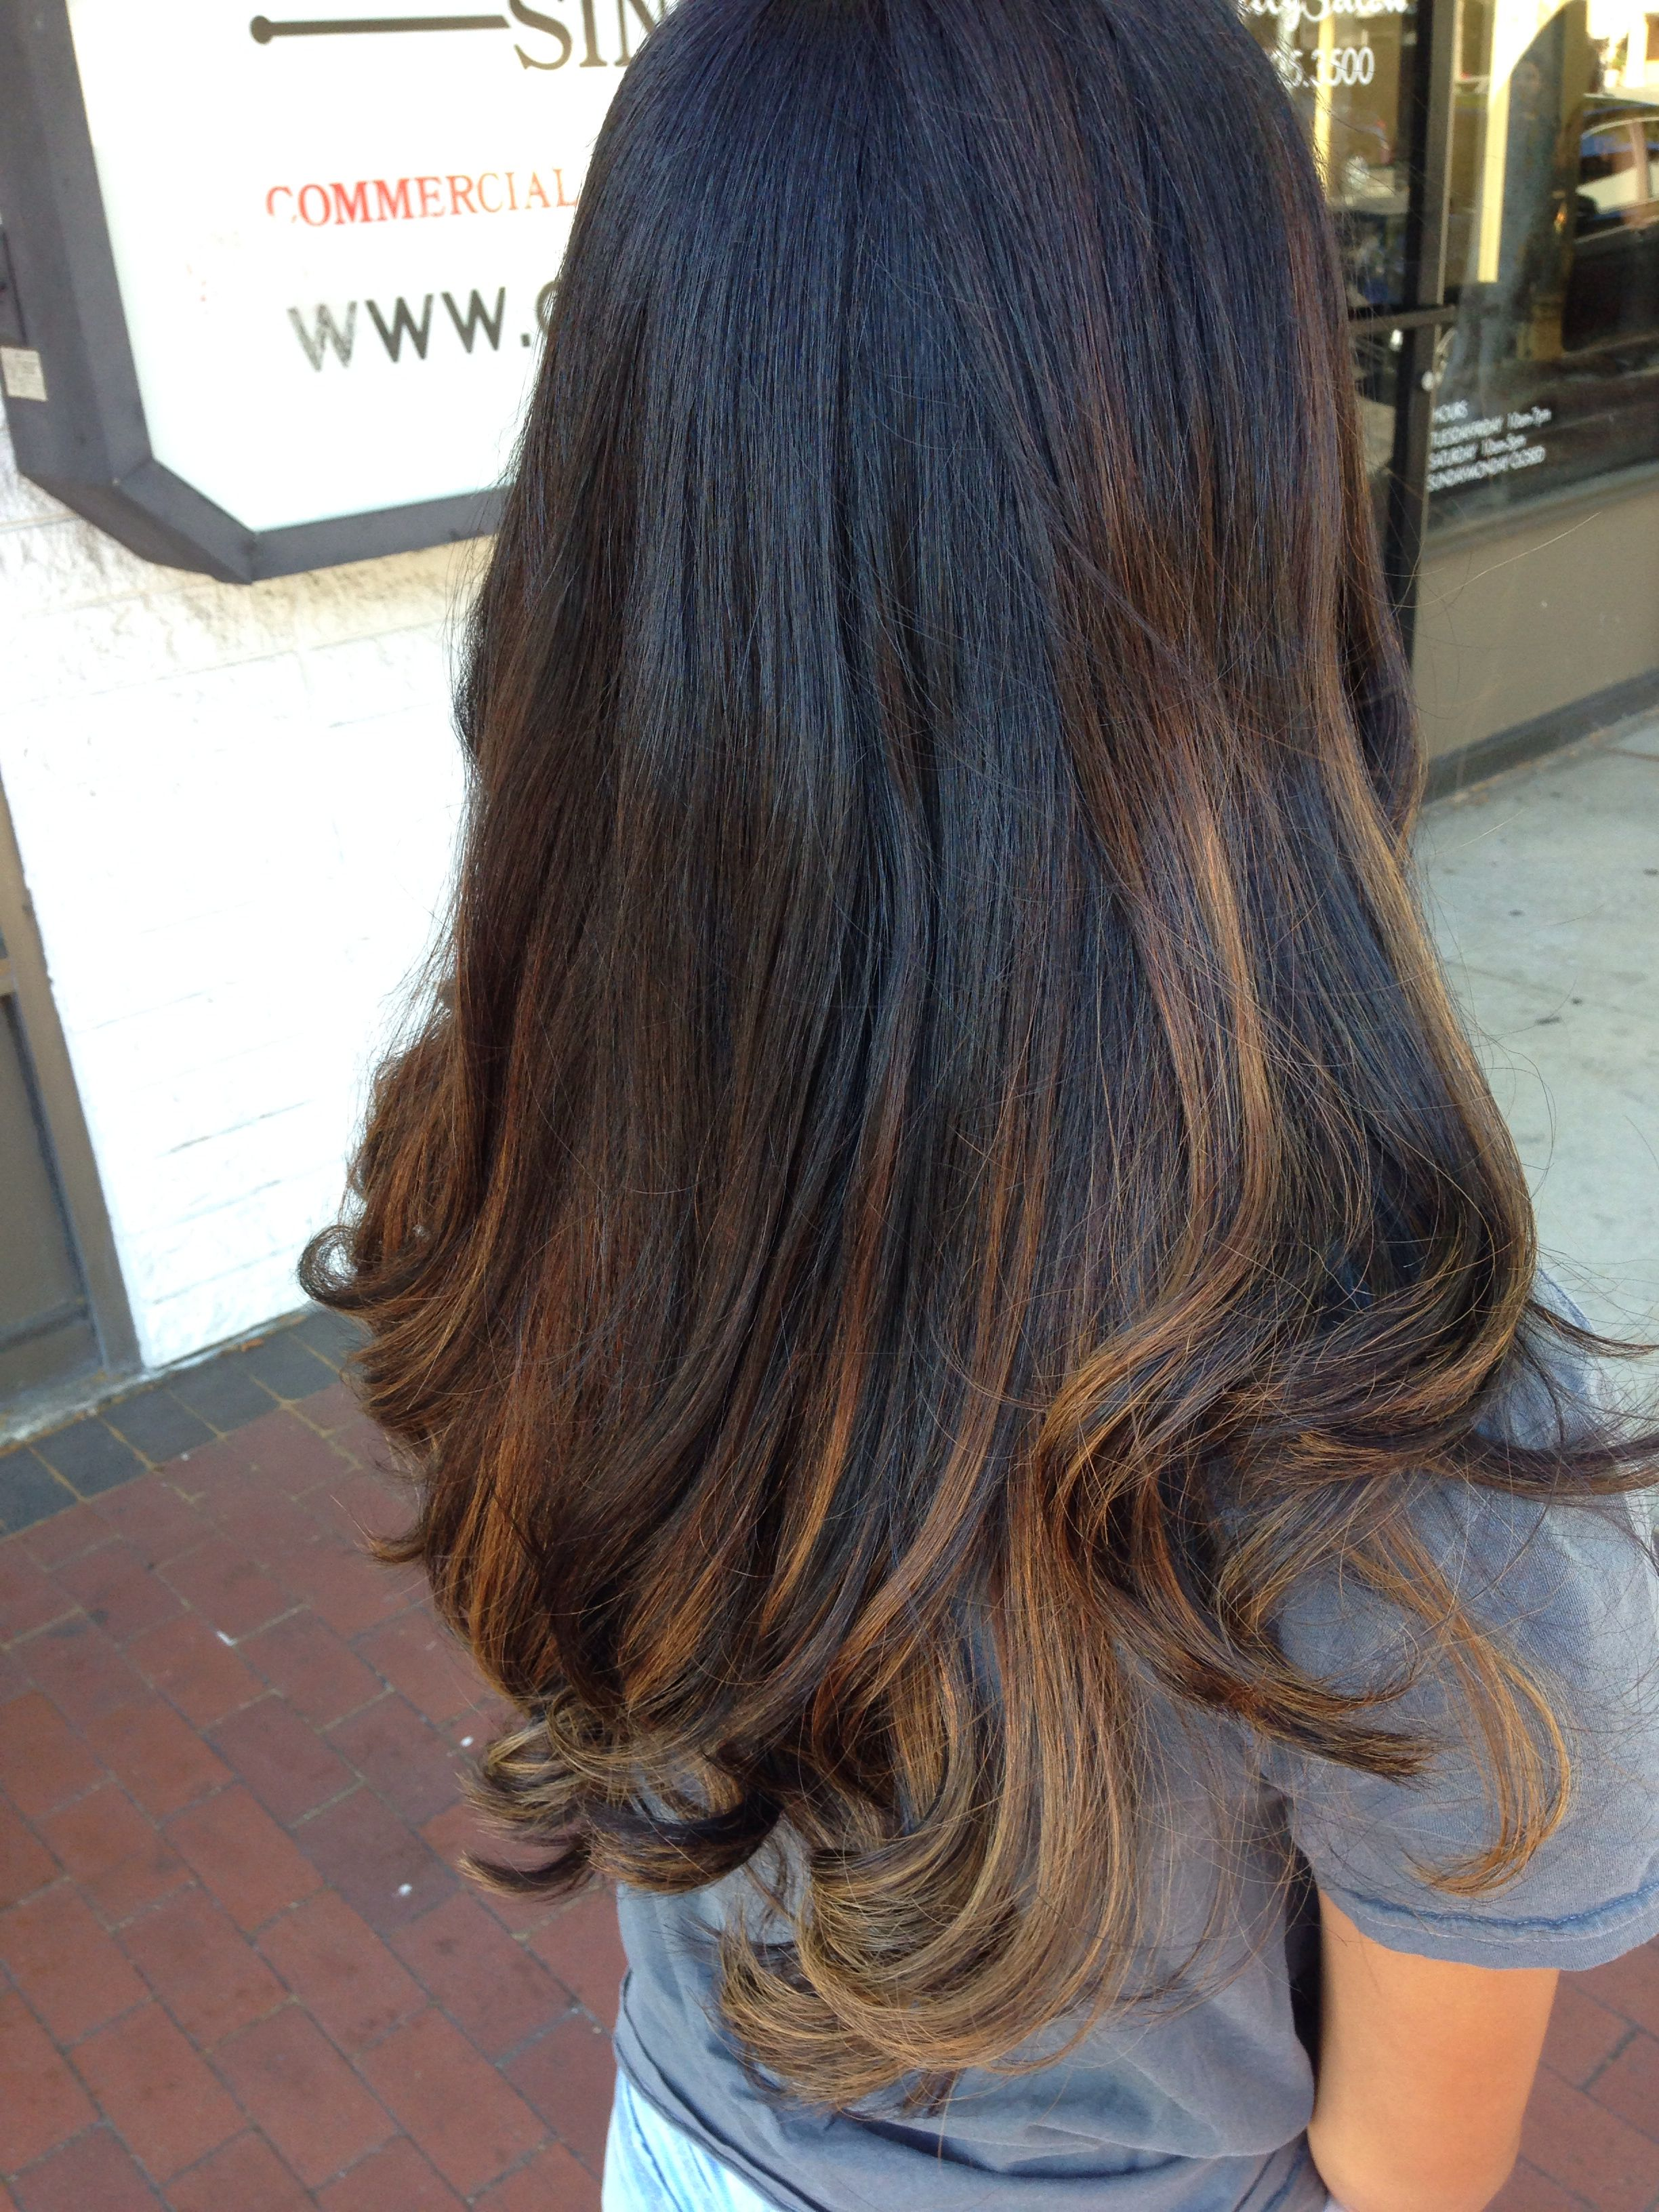 Baylage Highlights On Black Hair My Hair Done On 7 19 14 Hair Styles Baylage Hair Black Hair With Highlights